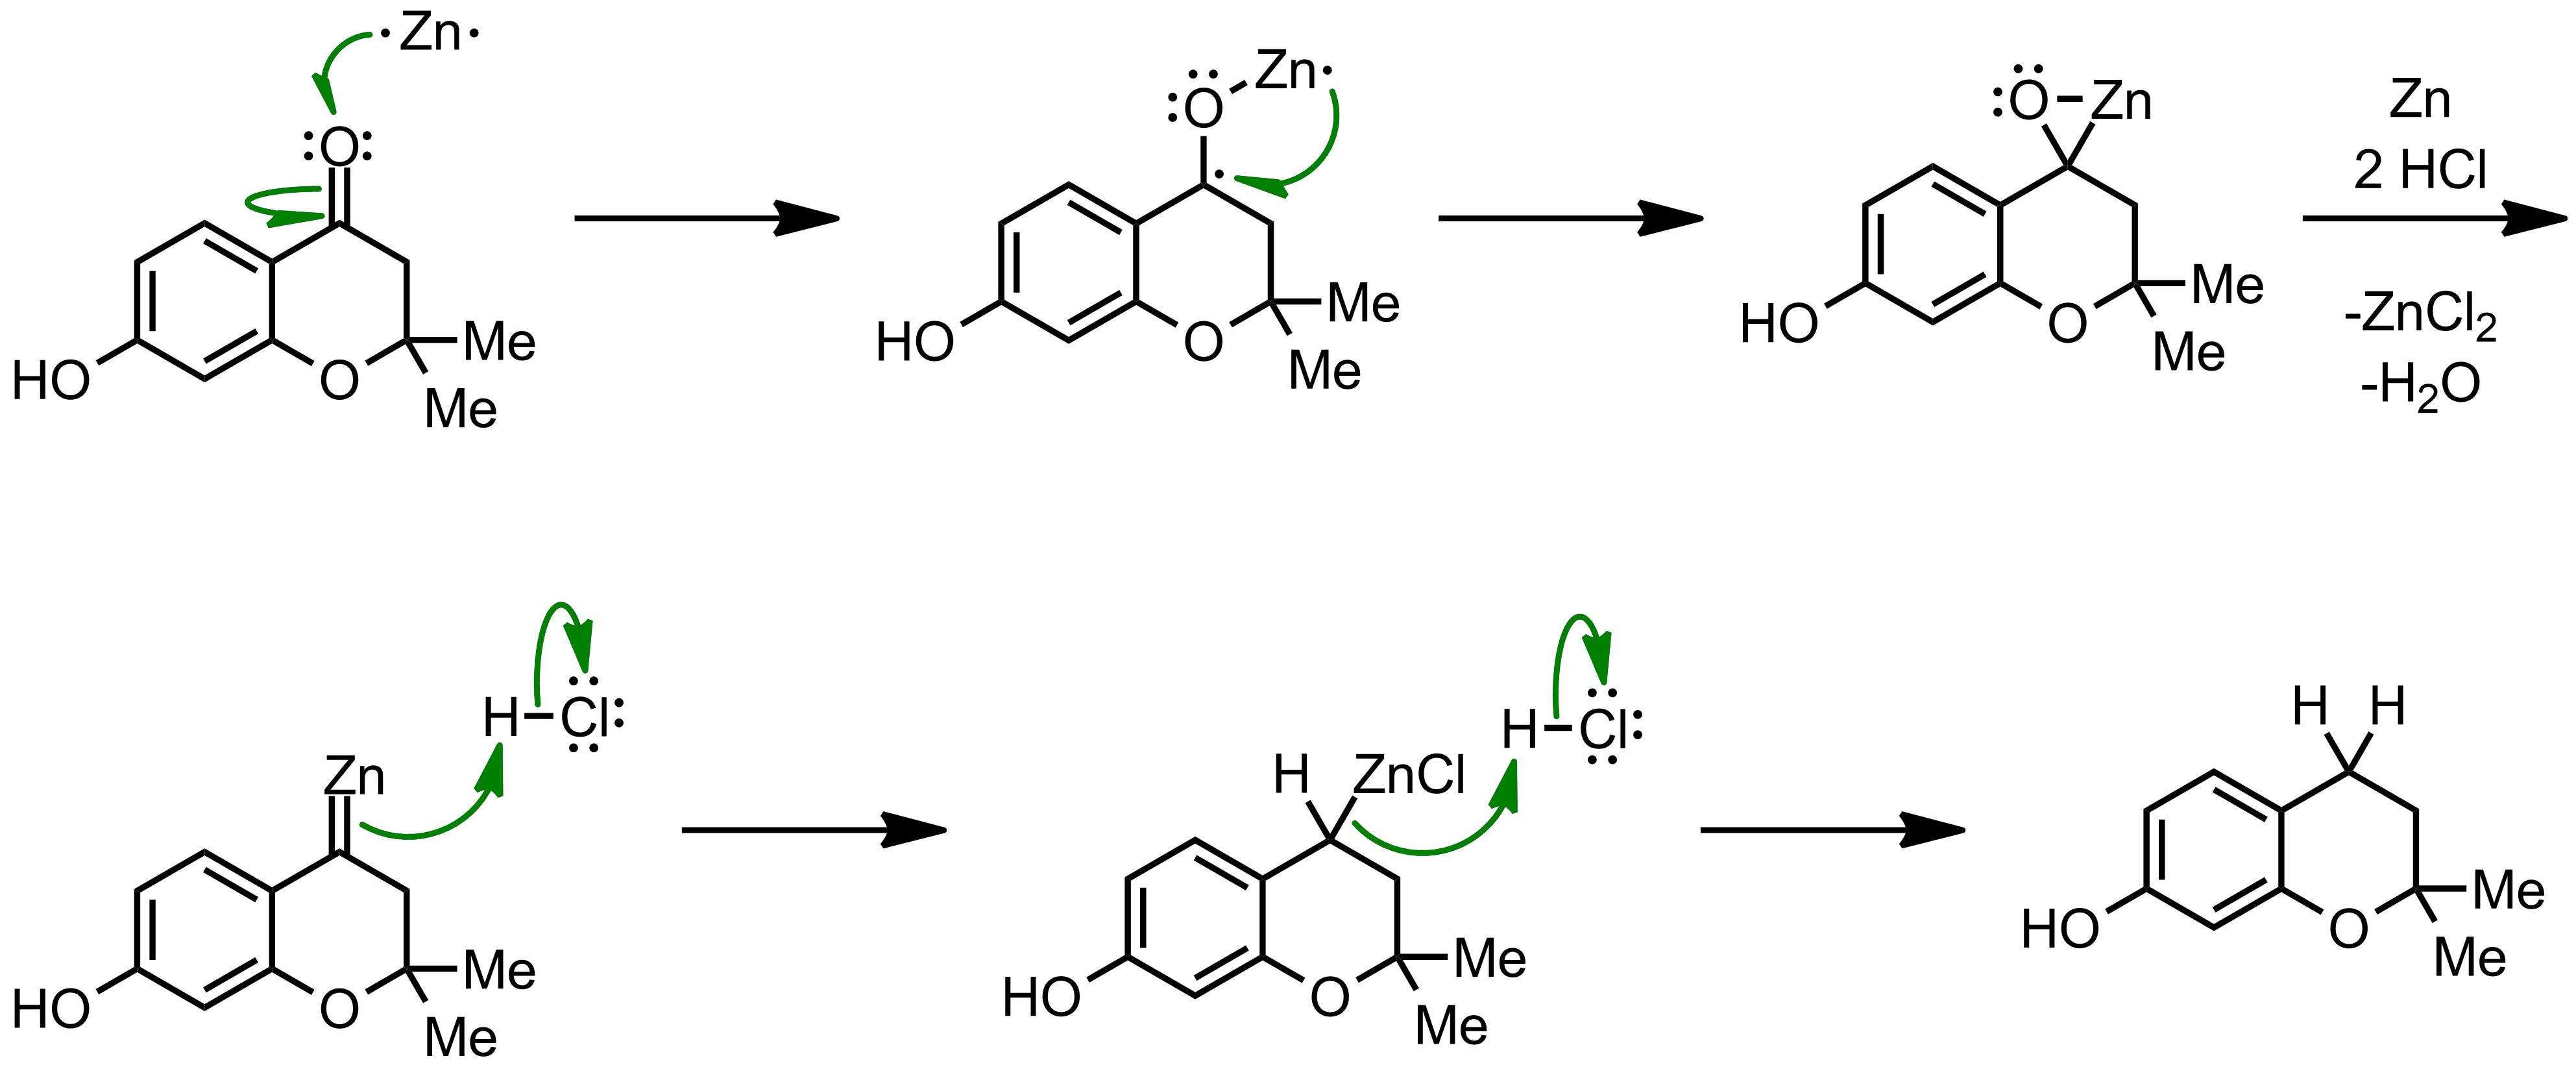 Mechanism of the Clemmensen Reduction